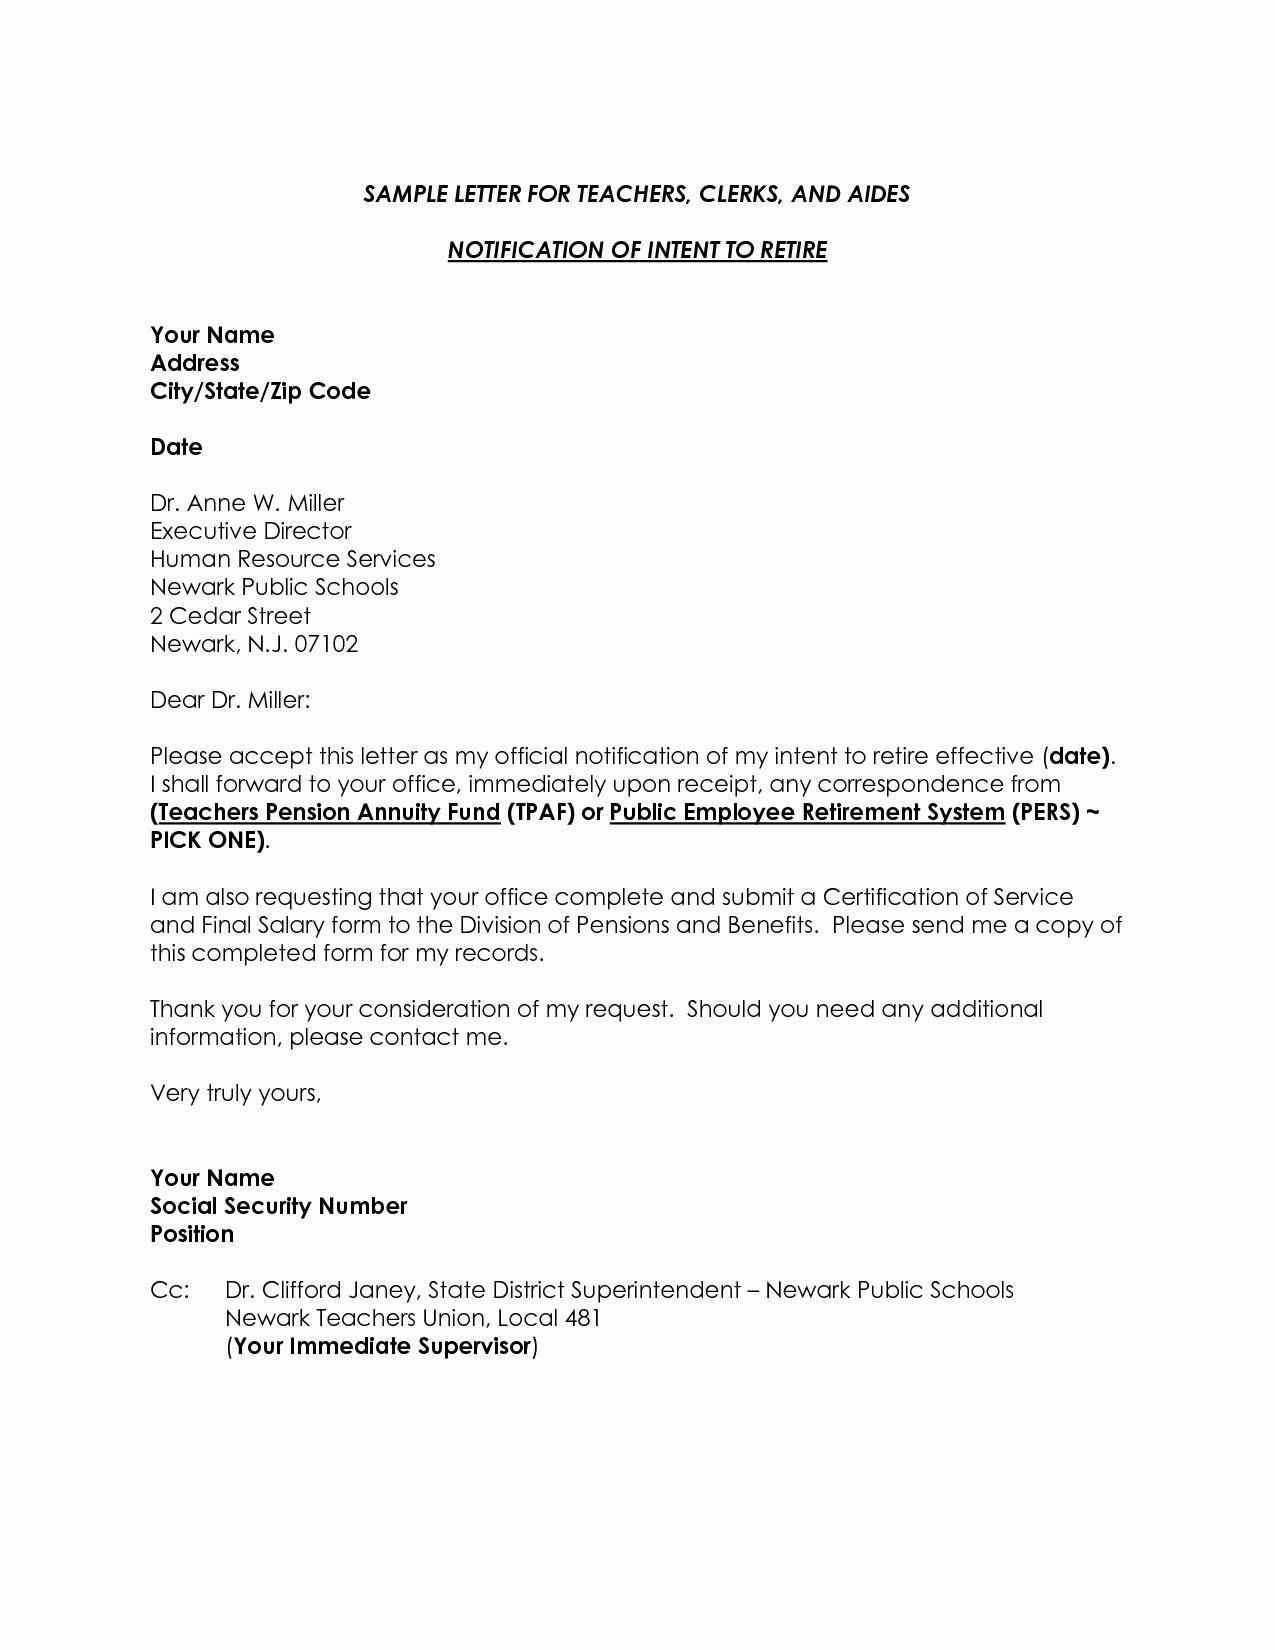 Letter Of Resignation Retirement Example Awesome Retirement Resignation Letter Template Free Collection